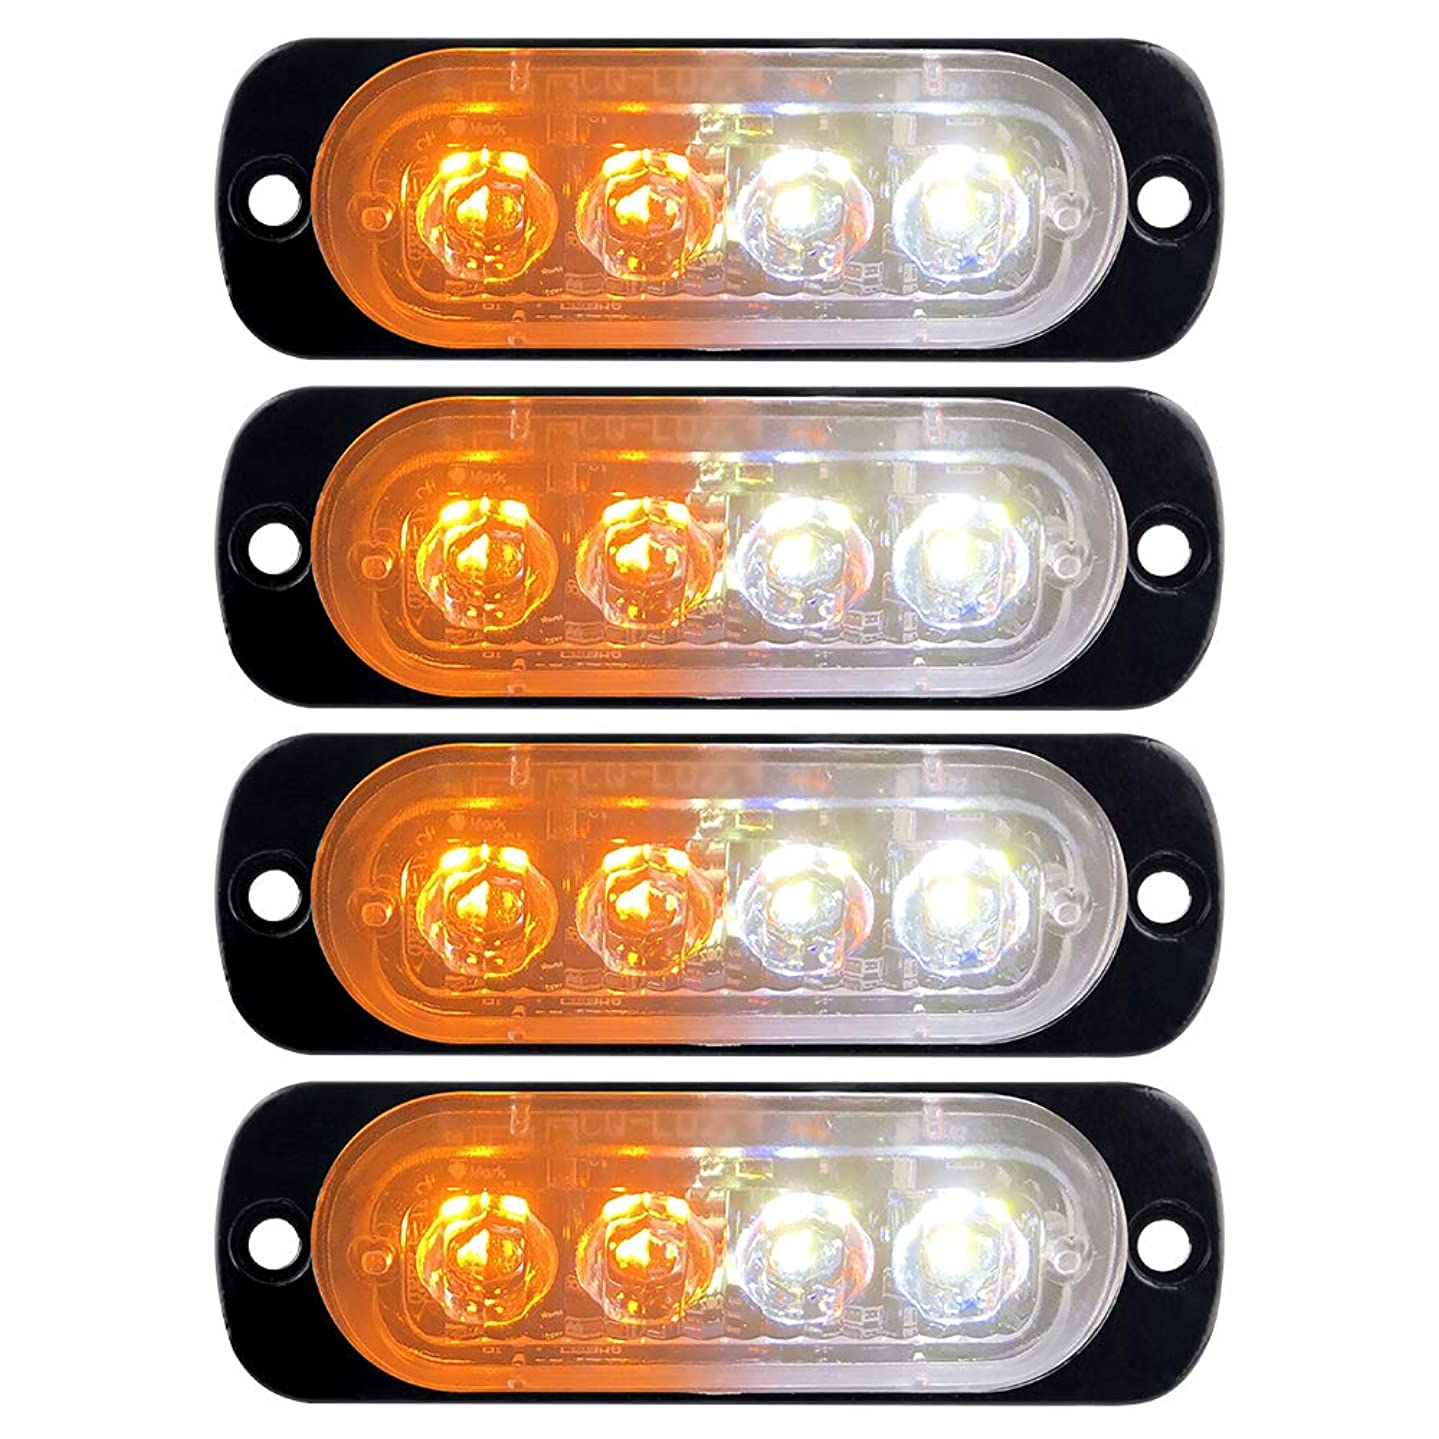 Super Bright Emergency Strobe Warning Light Bar Flash Beacon Caution Police Light Surface Mount for Car Truck Trailer Motorcycle 12-24V Amber&White-4PCS